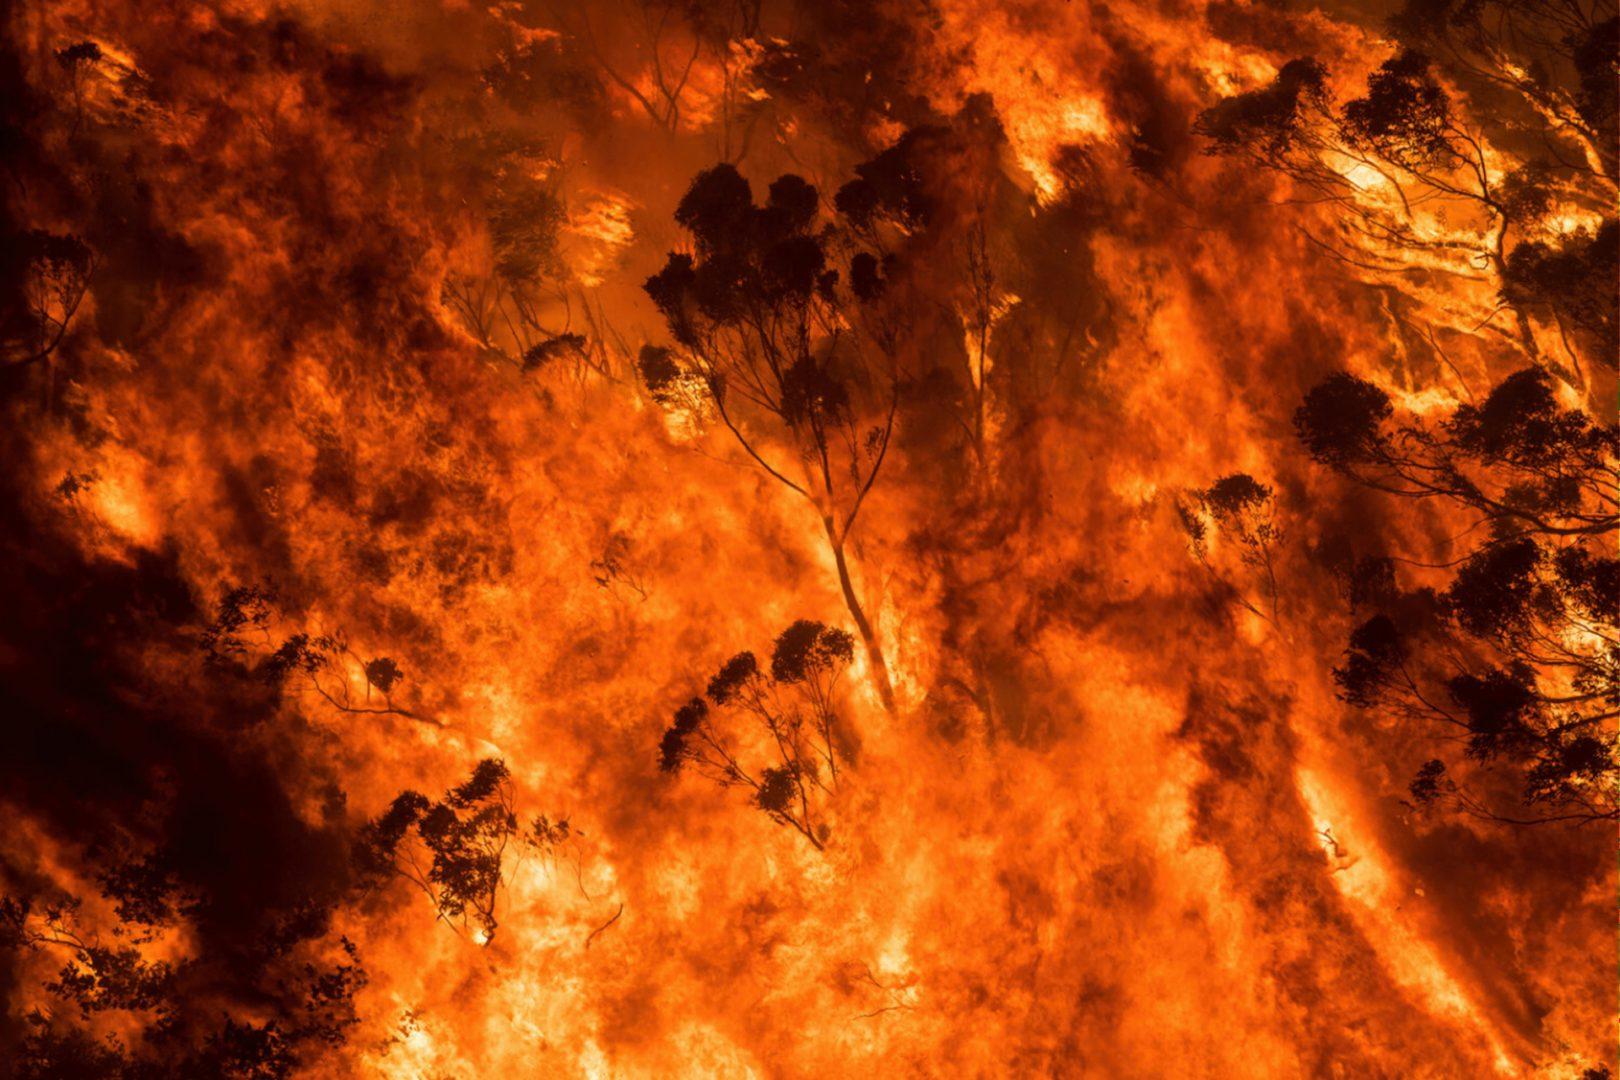 Artist and activist HAYDEN FOWLER on the Australian bushfires